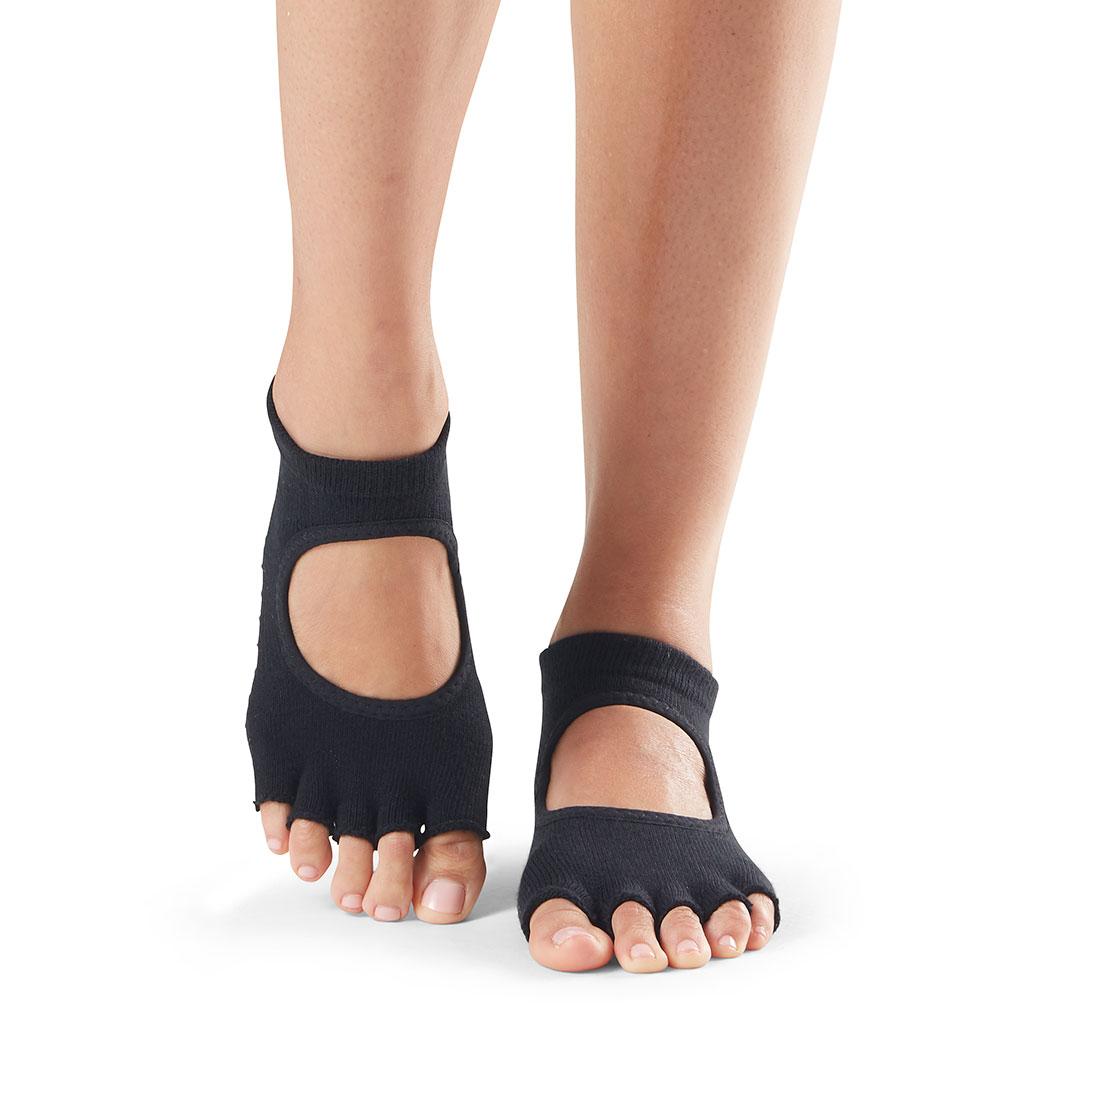 Yogasocken ToeSox Bellarina Half Toe Black - 1